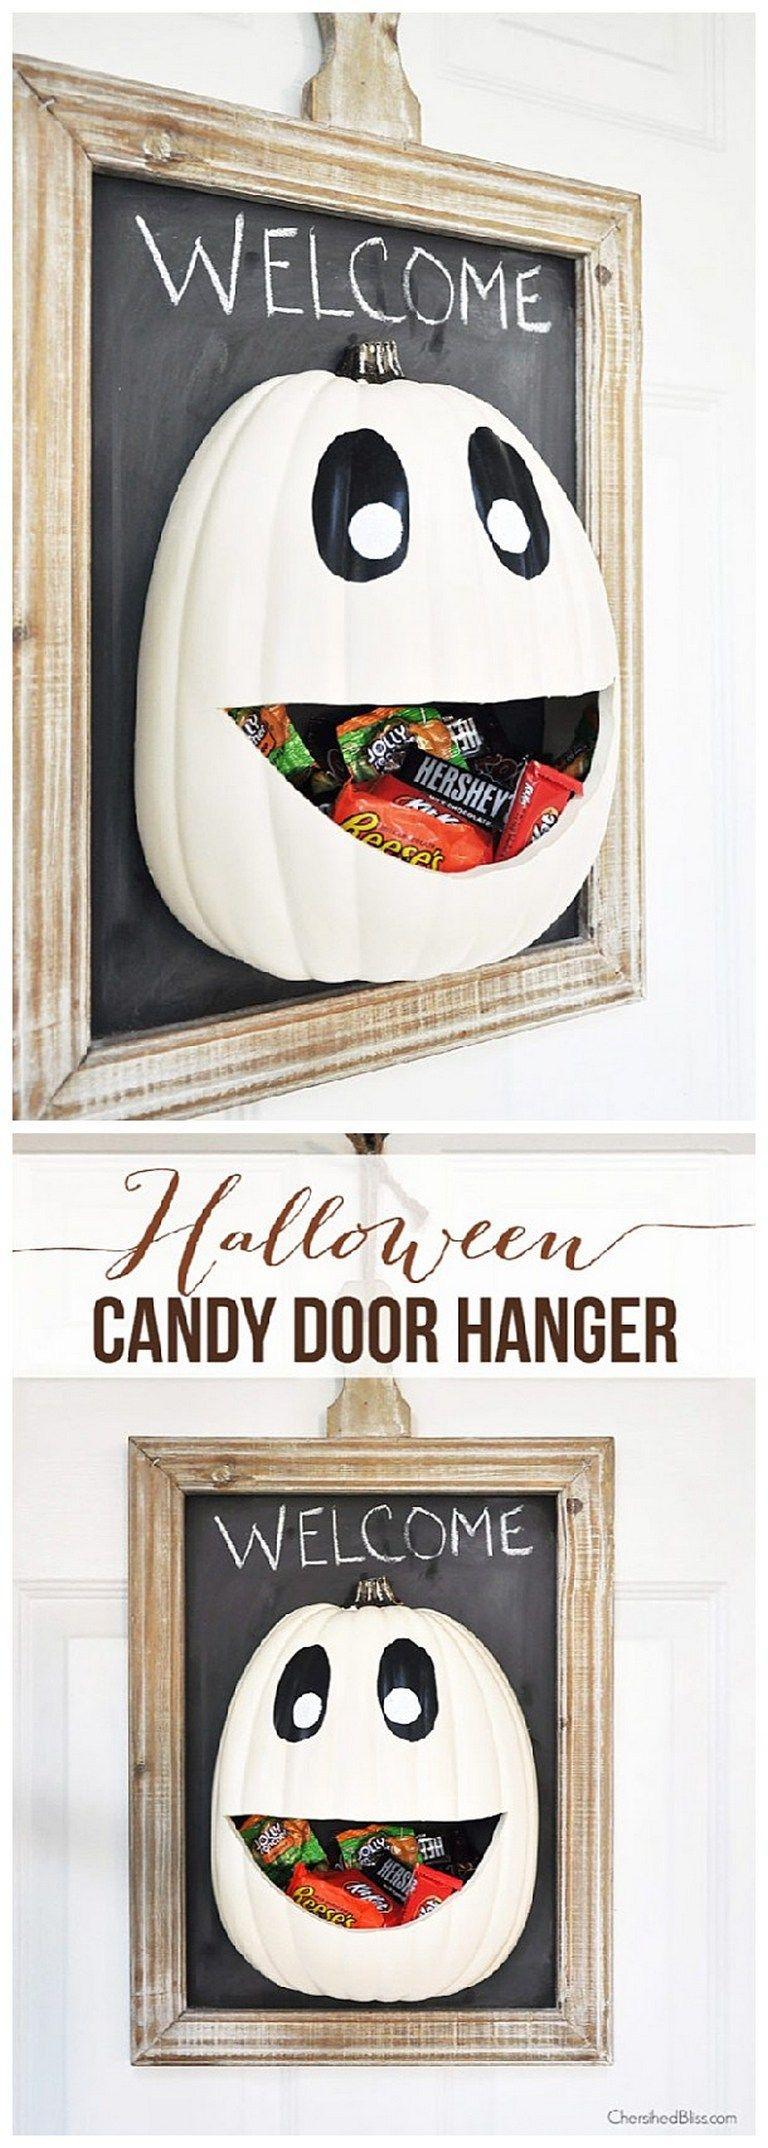 90+ DIY Project Halloween Decorations Ideas | Decoration, Halloween ...